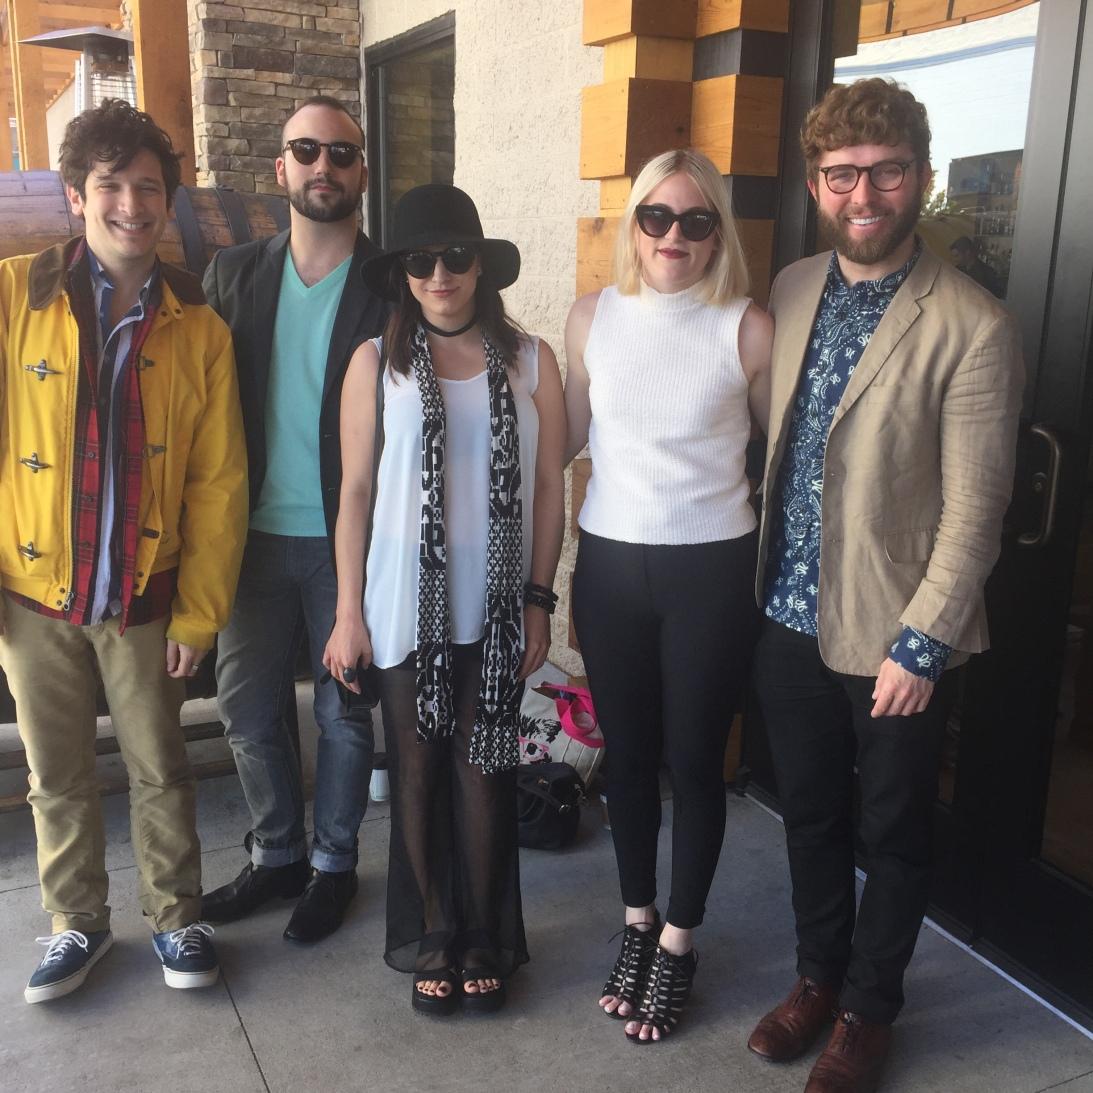 Jeff, Robby, Marisa, WC, Timo